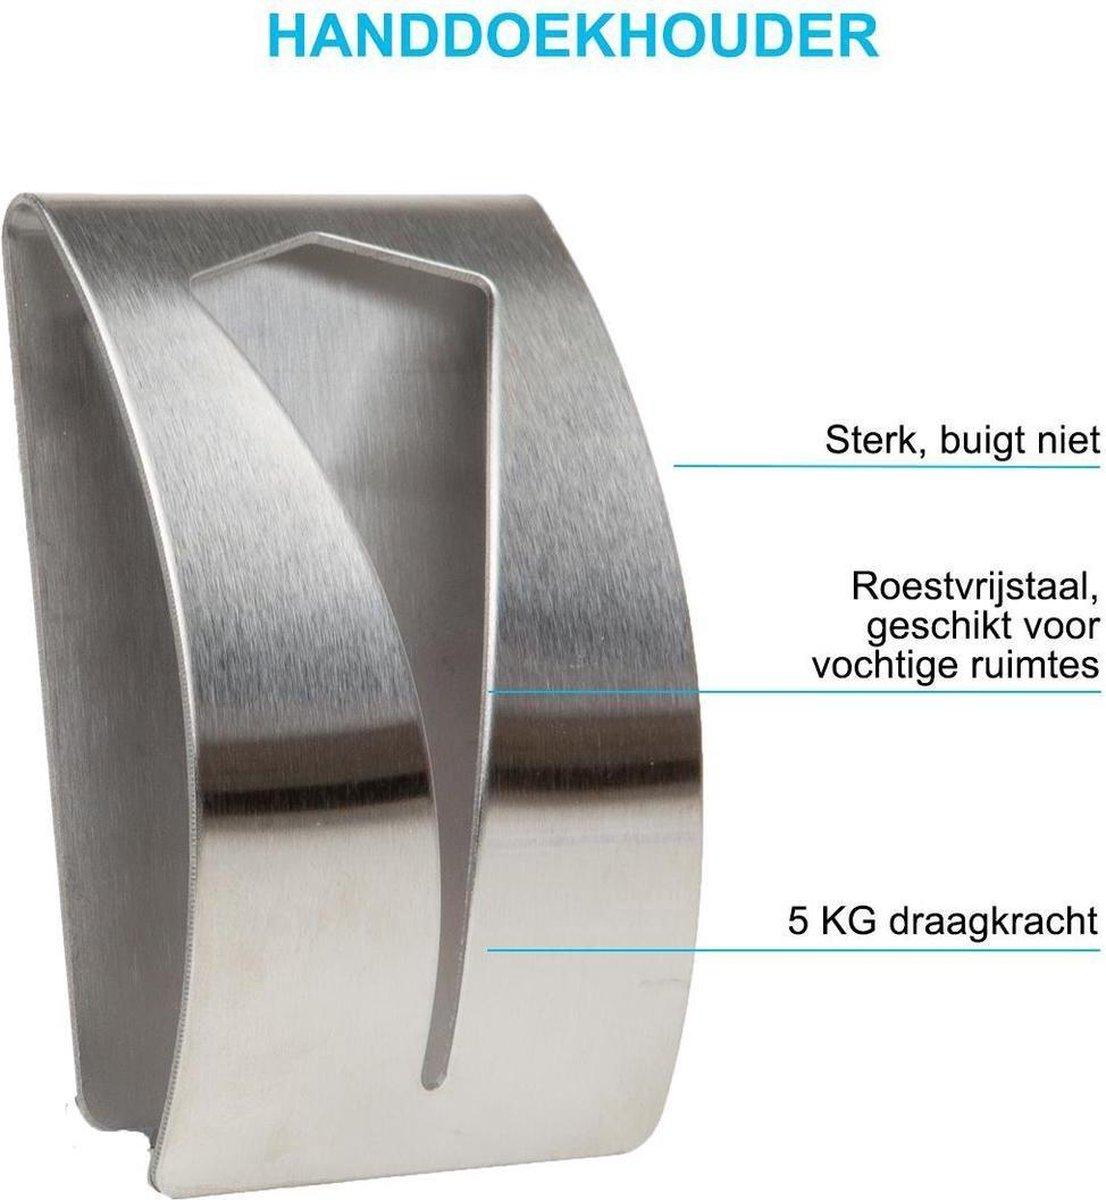 2 Stuks RVS Handdoekhouder - Zelfklevend - Design Handdoek - Handdoek Klem - Handdoek haak